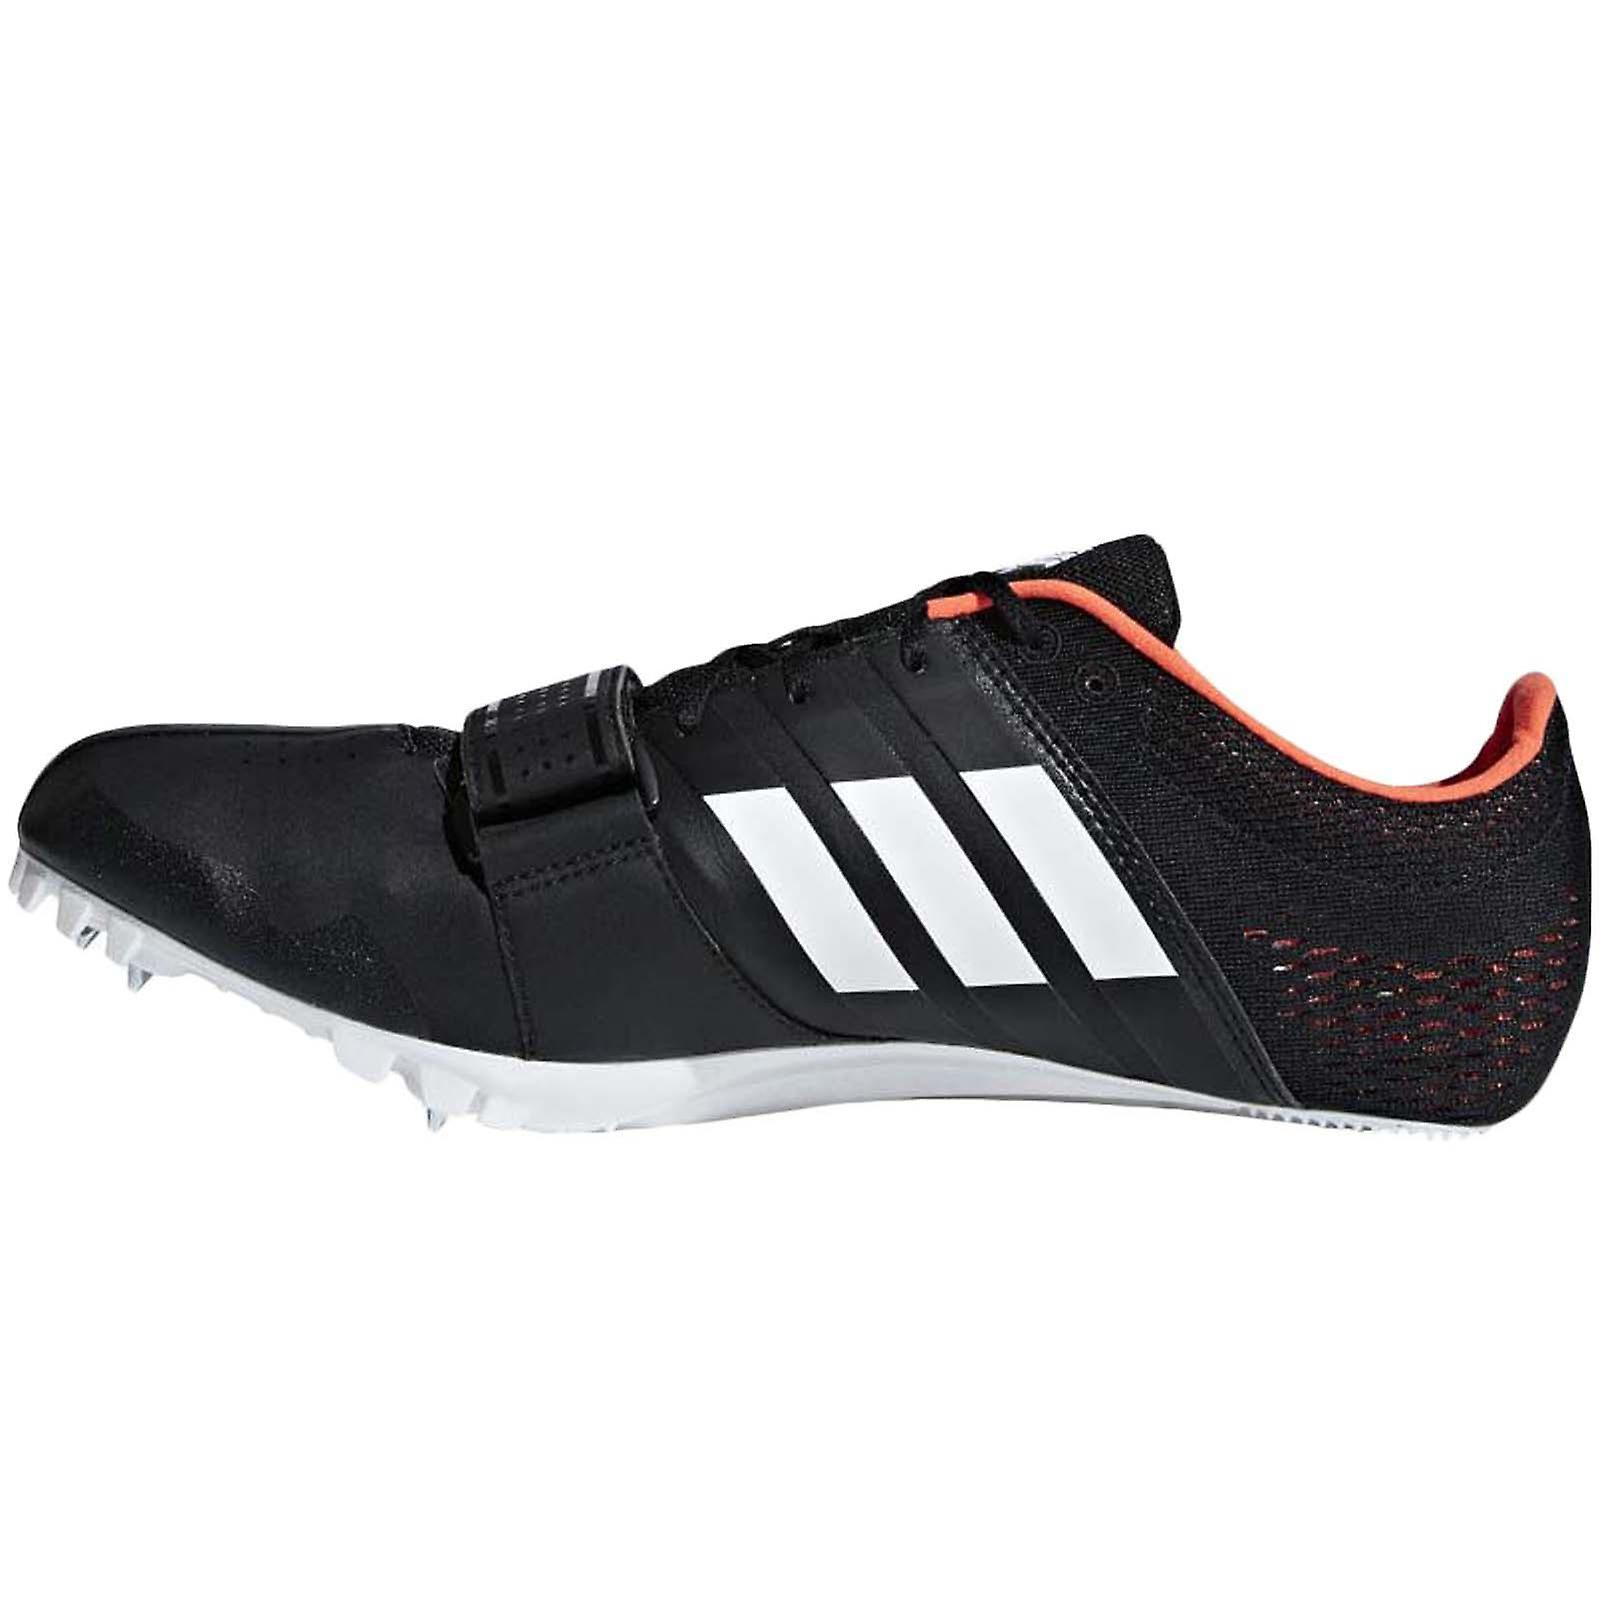 adidas Performance Mens adizero acceleratore Track & Field Running Spikes - Nero J5PJyt